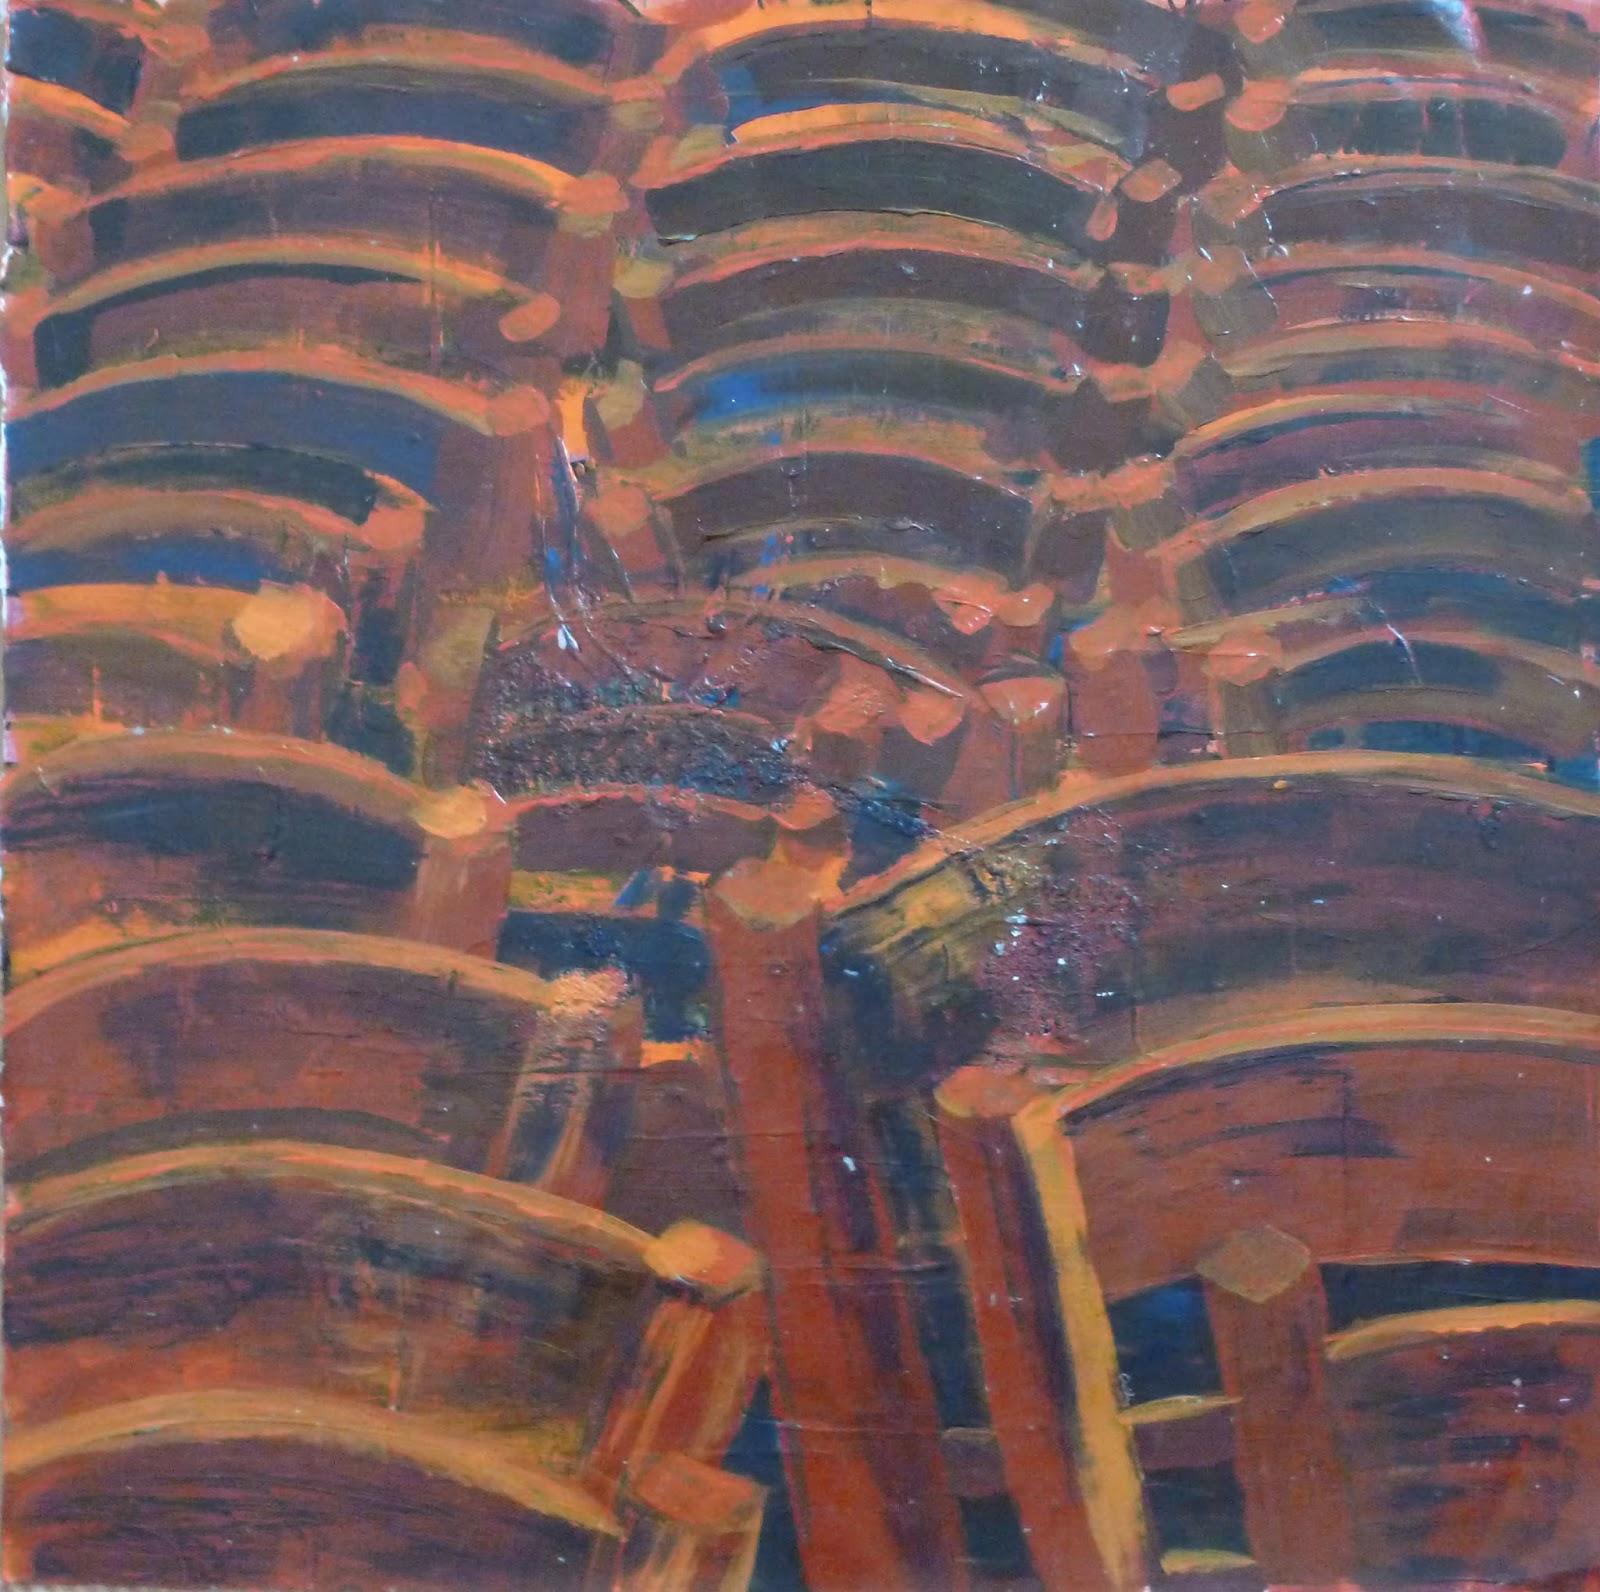 Rouen Chairs